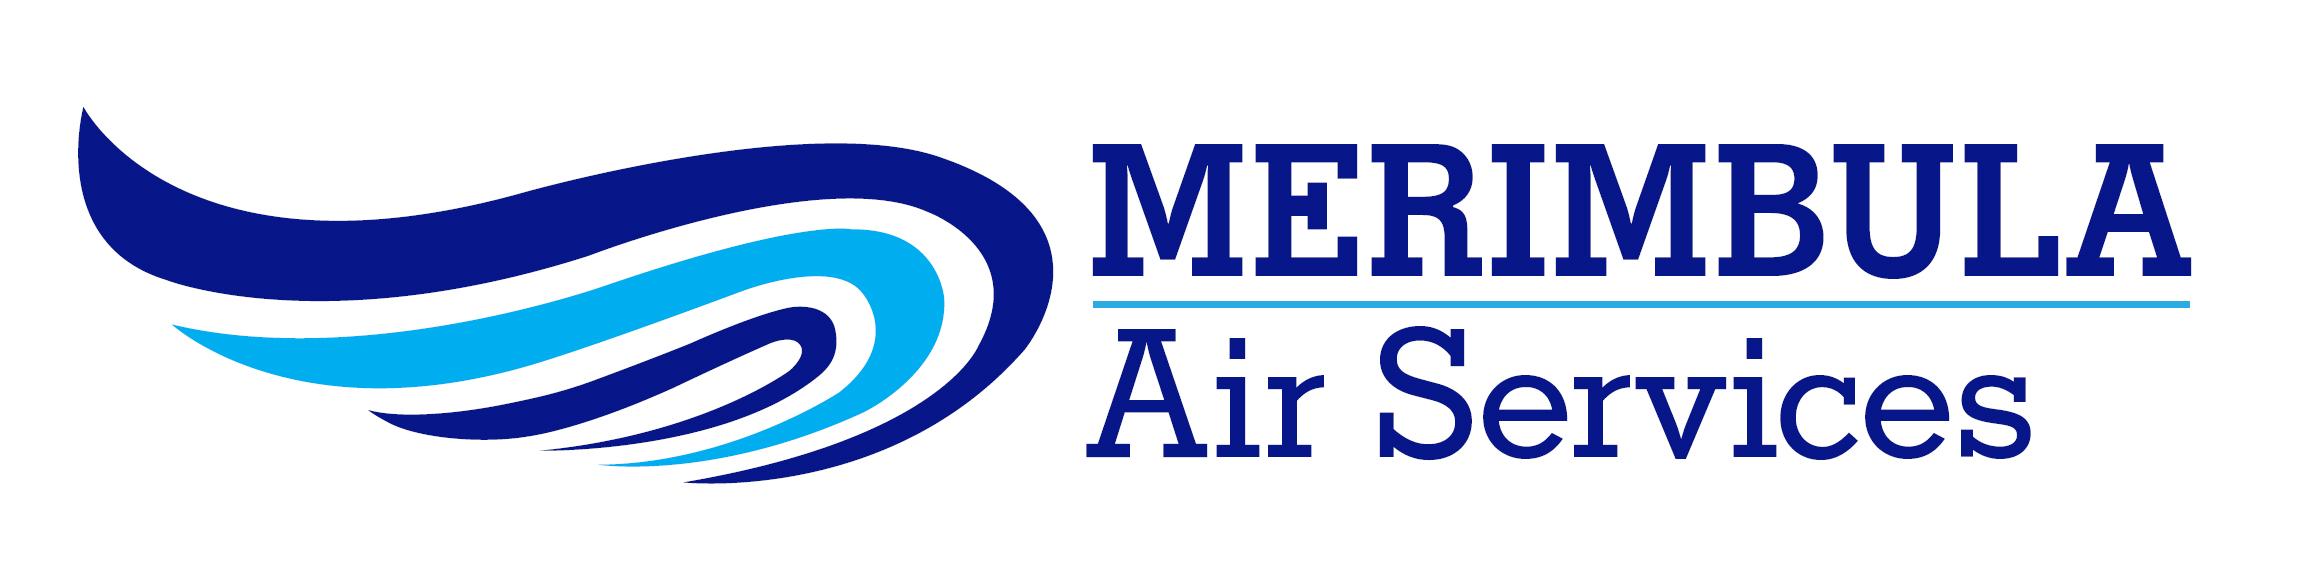 Merimbula Air Services